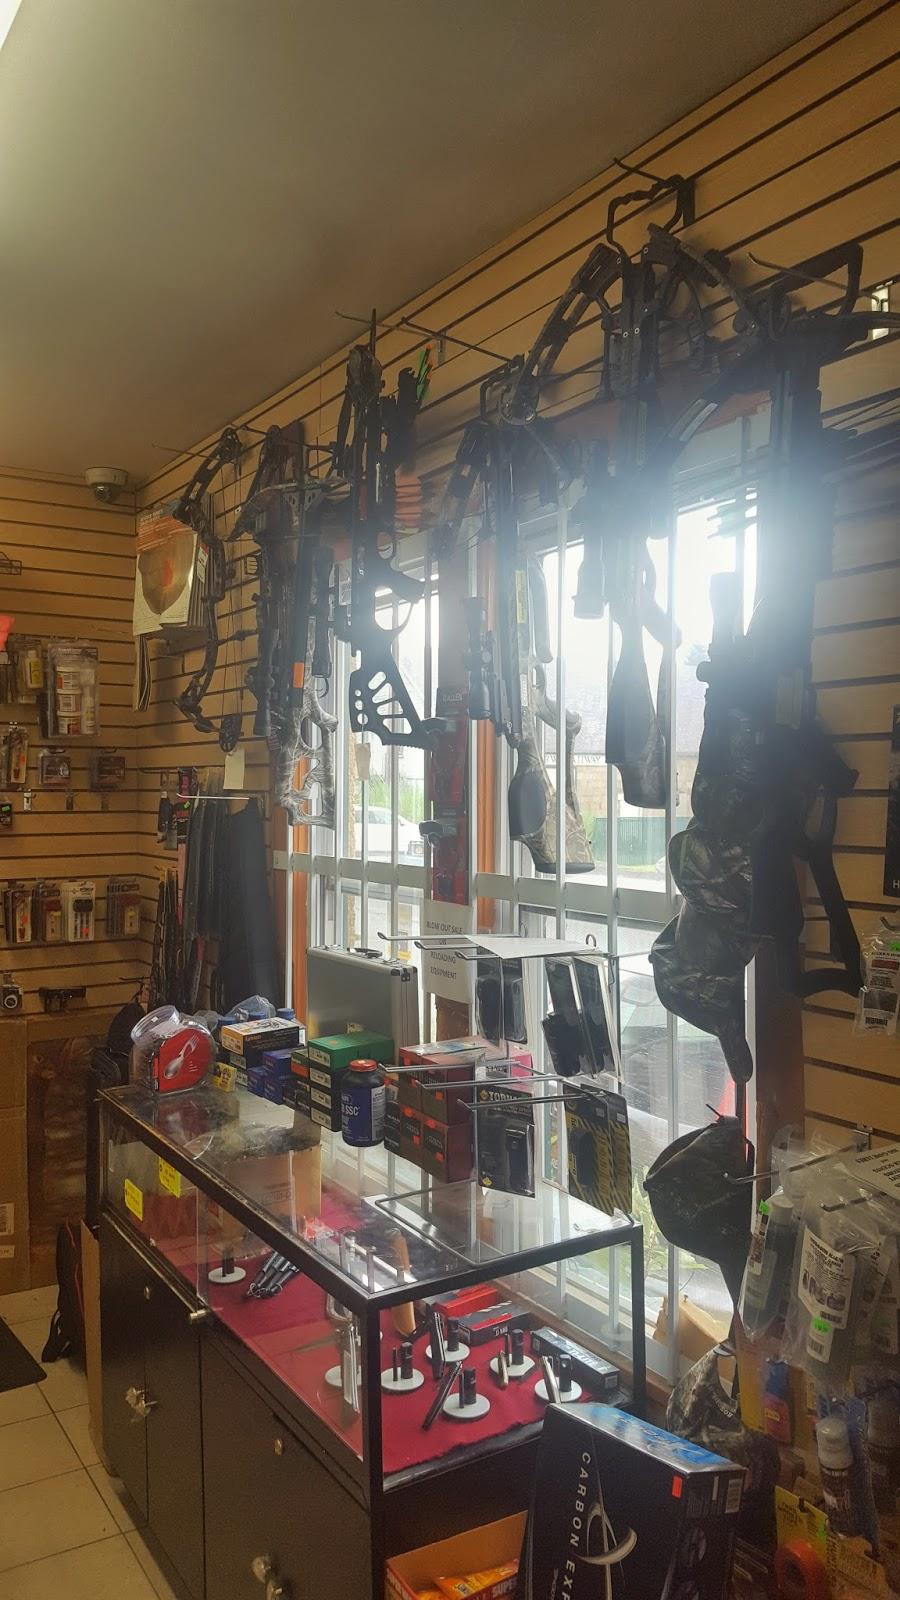 BIG DOG ARMS - store  | Photo 5 of 5 | Address: 48 Stewart Ave, Roscoe, NY 12776, USA | Phone: (607) 498-4867